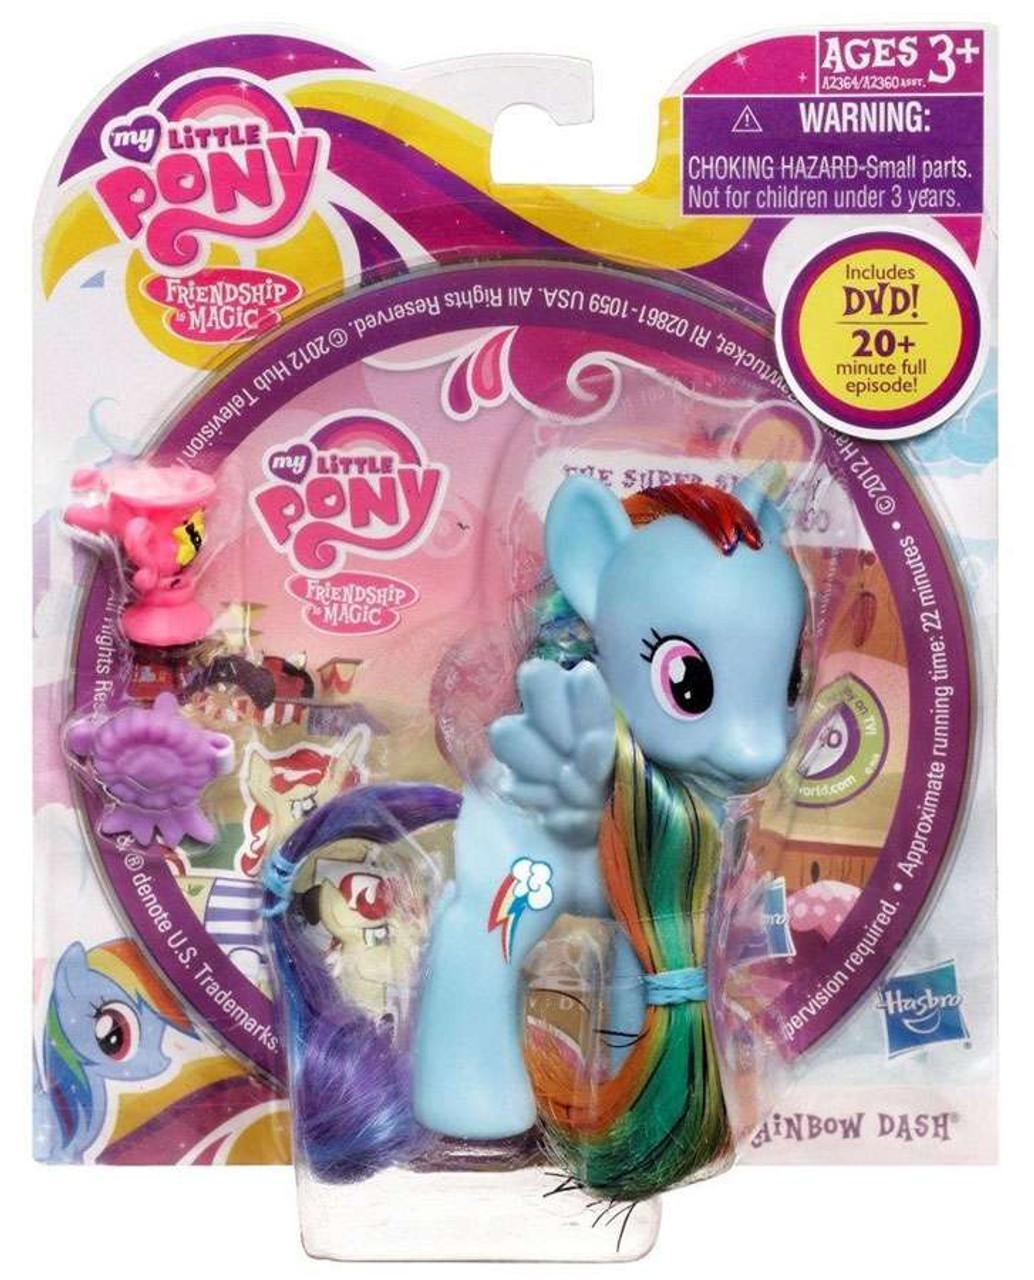 My Little Pony Friendship is Magic DVD Packs Rainbow Dash Figure [With Ribbon]